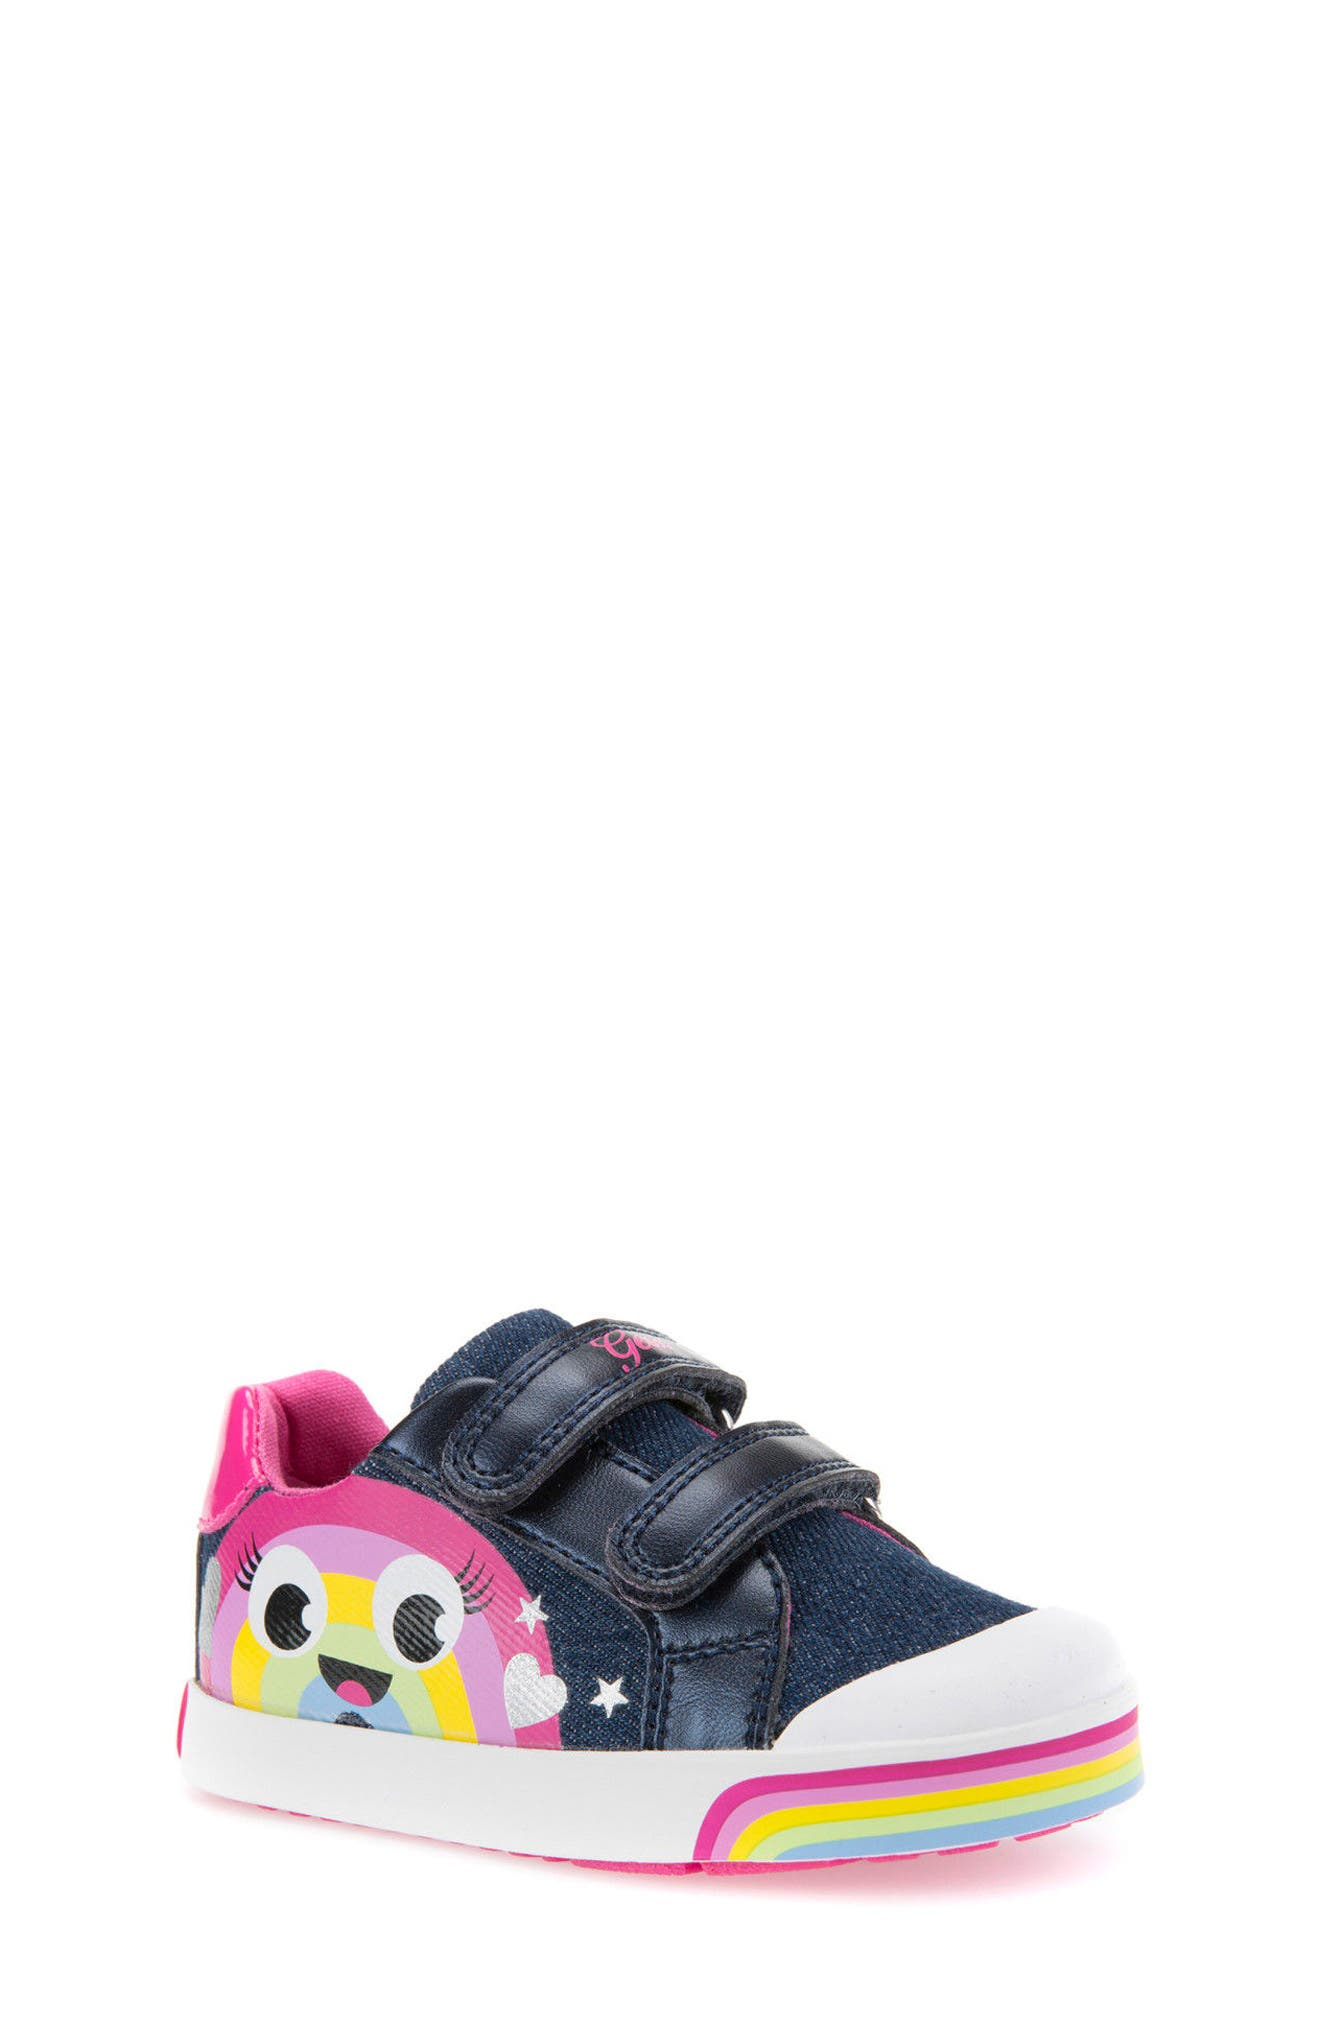 Kilwi Low Top Sneaker,                         Main,                         color, Avio/ Multicolor